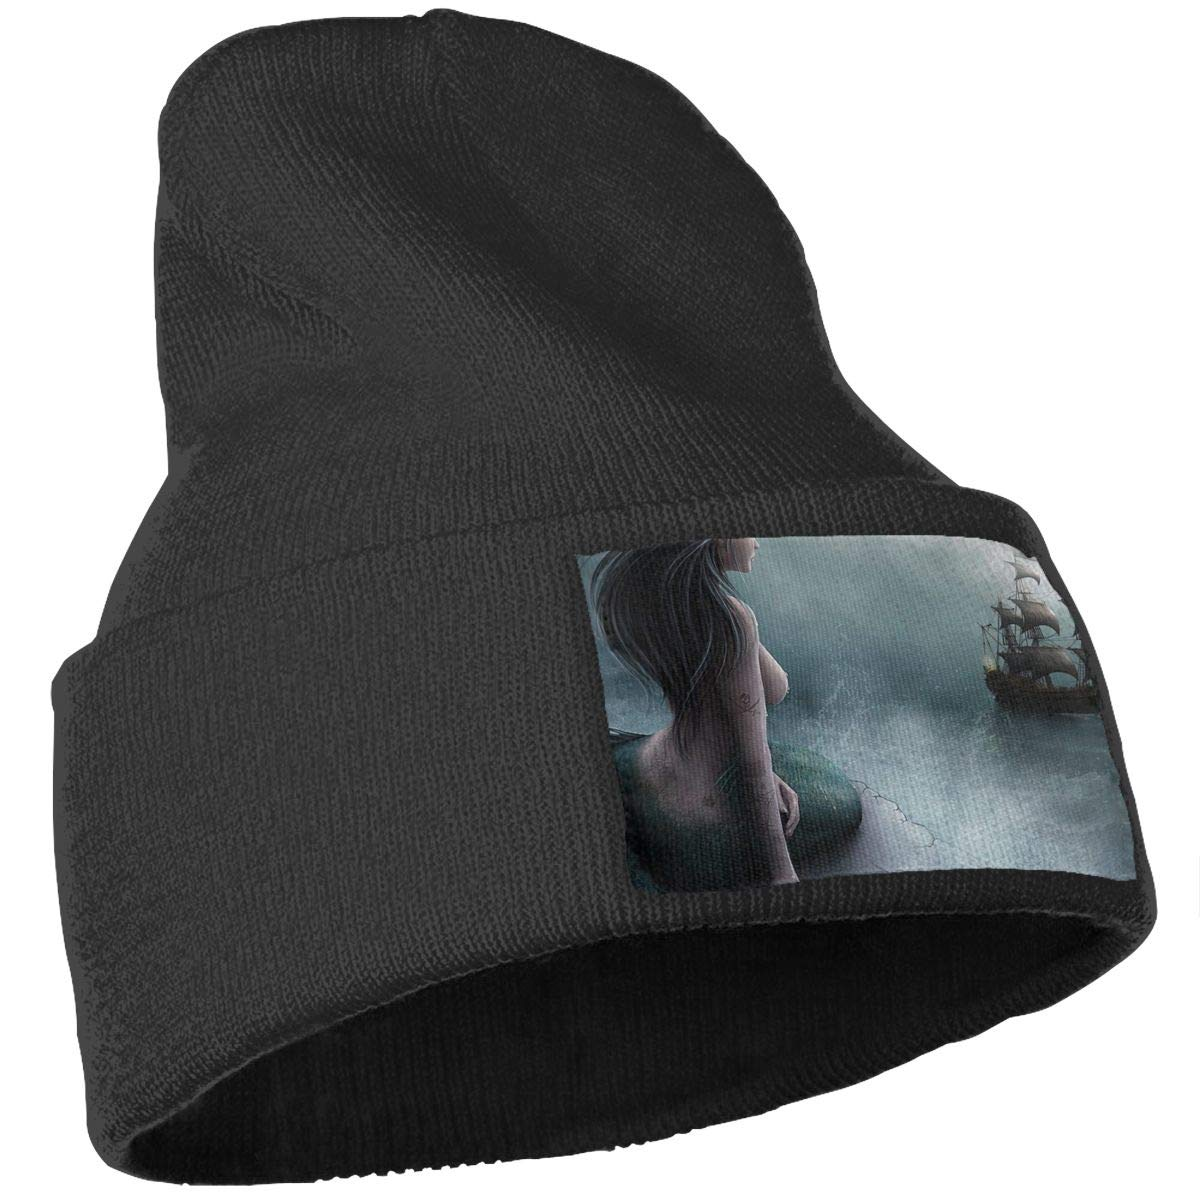 Mermaid and The Sailing Ship Men Women Plain Cuff Knit Beanie Hat Skull Ski Beanie